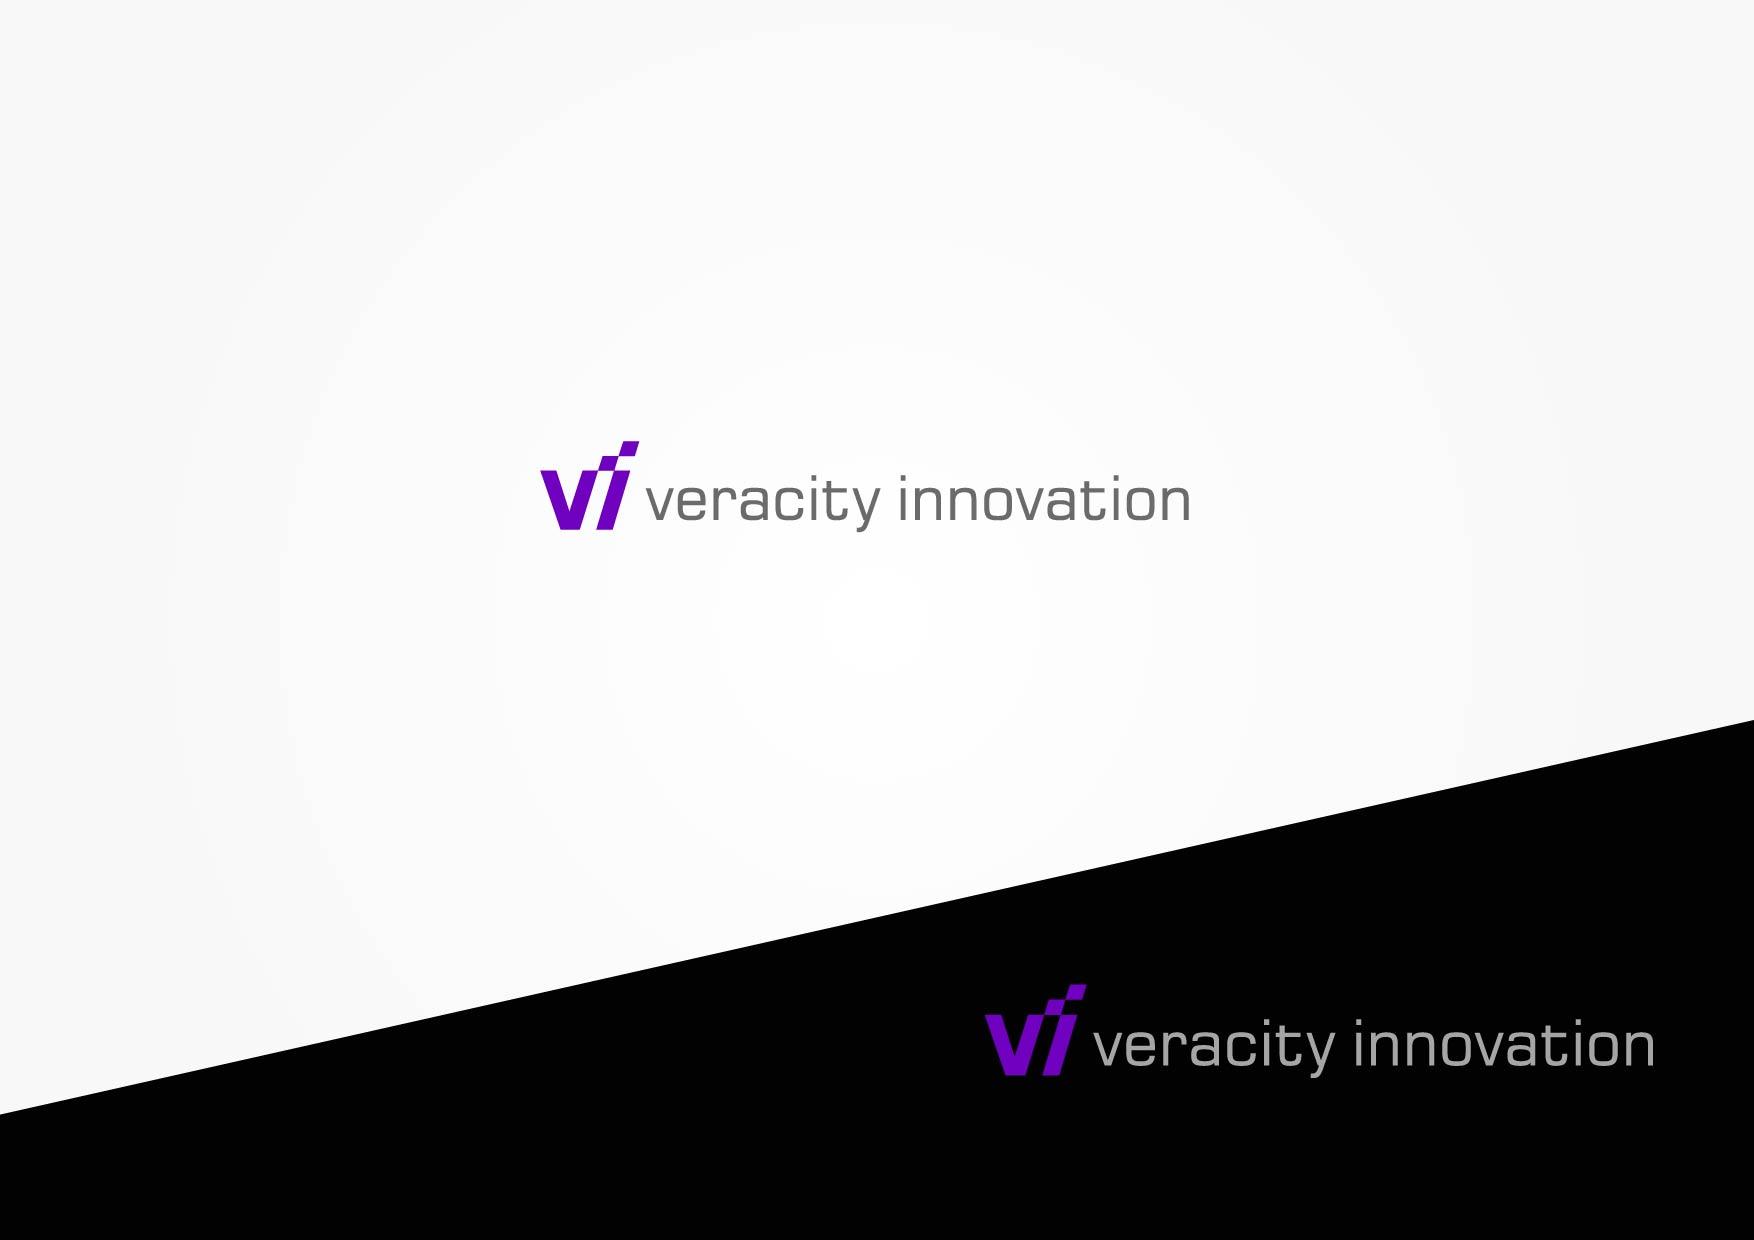 Logo Design by Osi Indra - Entry No. 70 in the Logo Design Contest Creative Logo Design for Veracity Innovation, LLC.